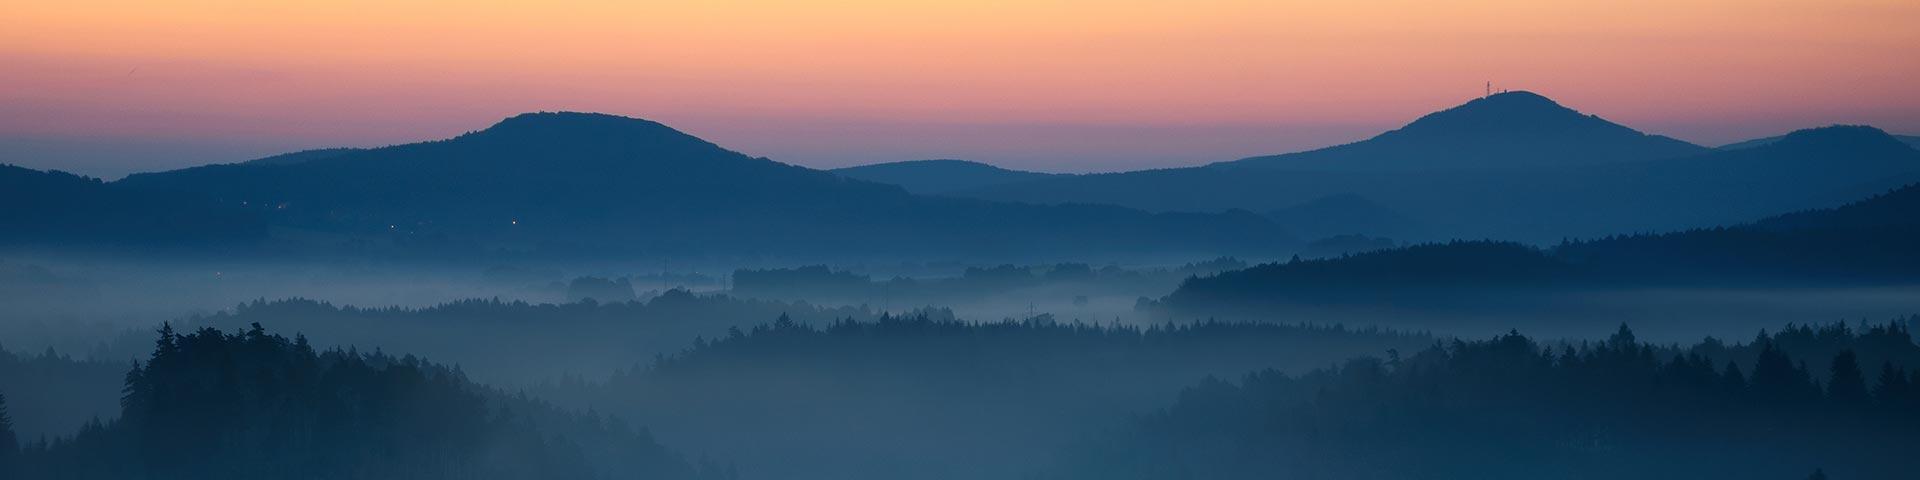 Ústí nad Labem Region